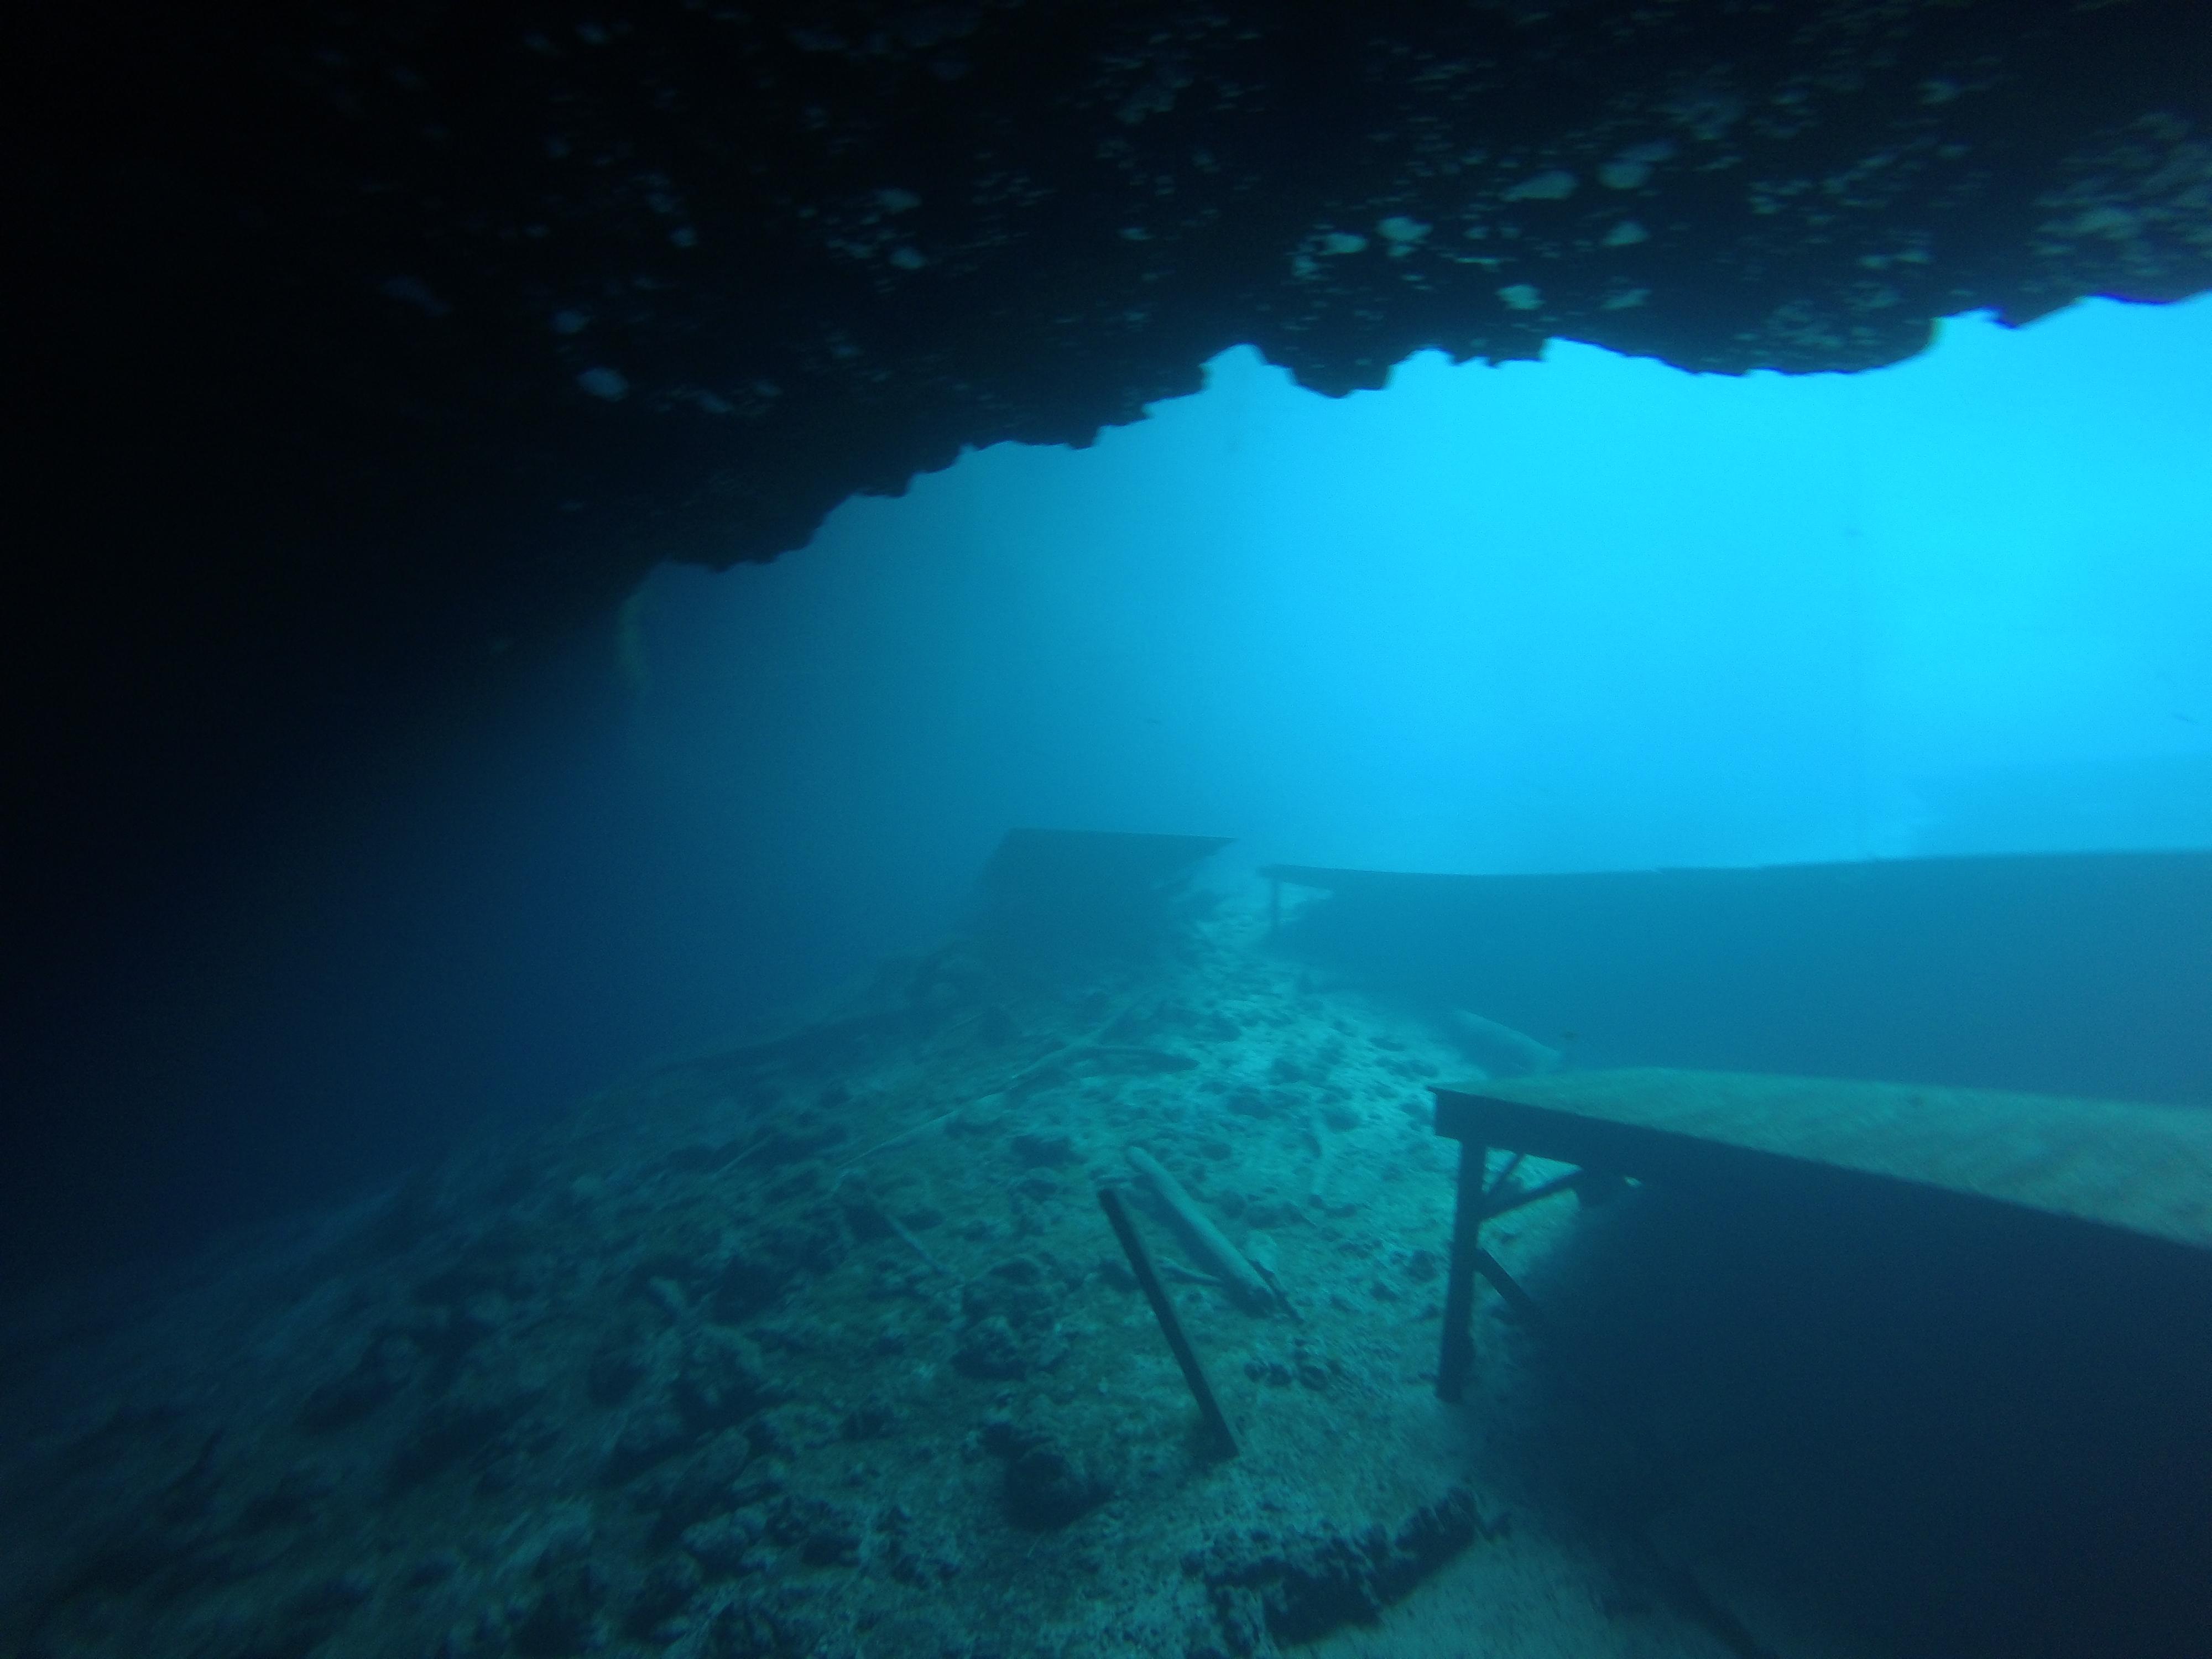 Underwater Wasteland @ Blue Grotto [OC] [OS] [4000x3000]